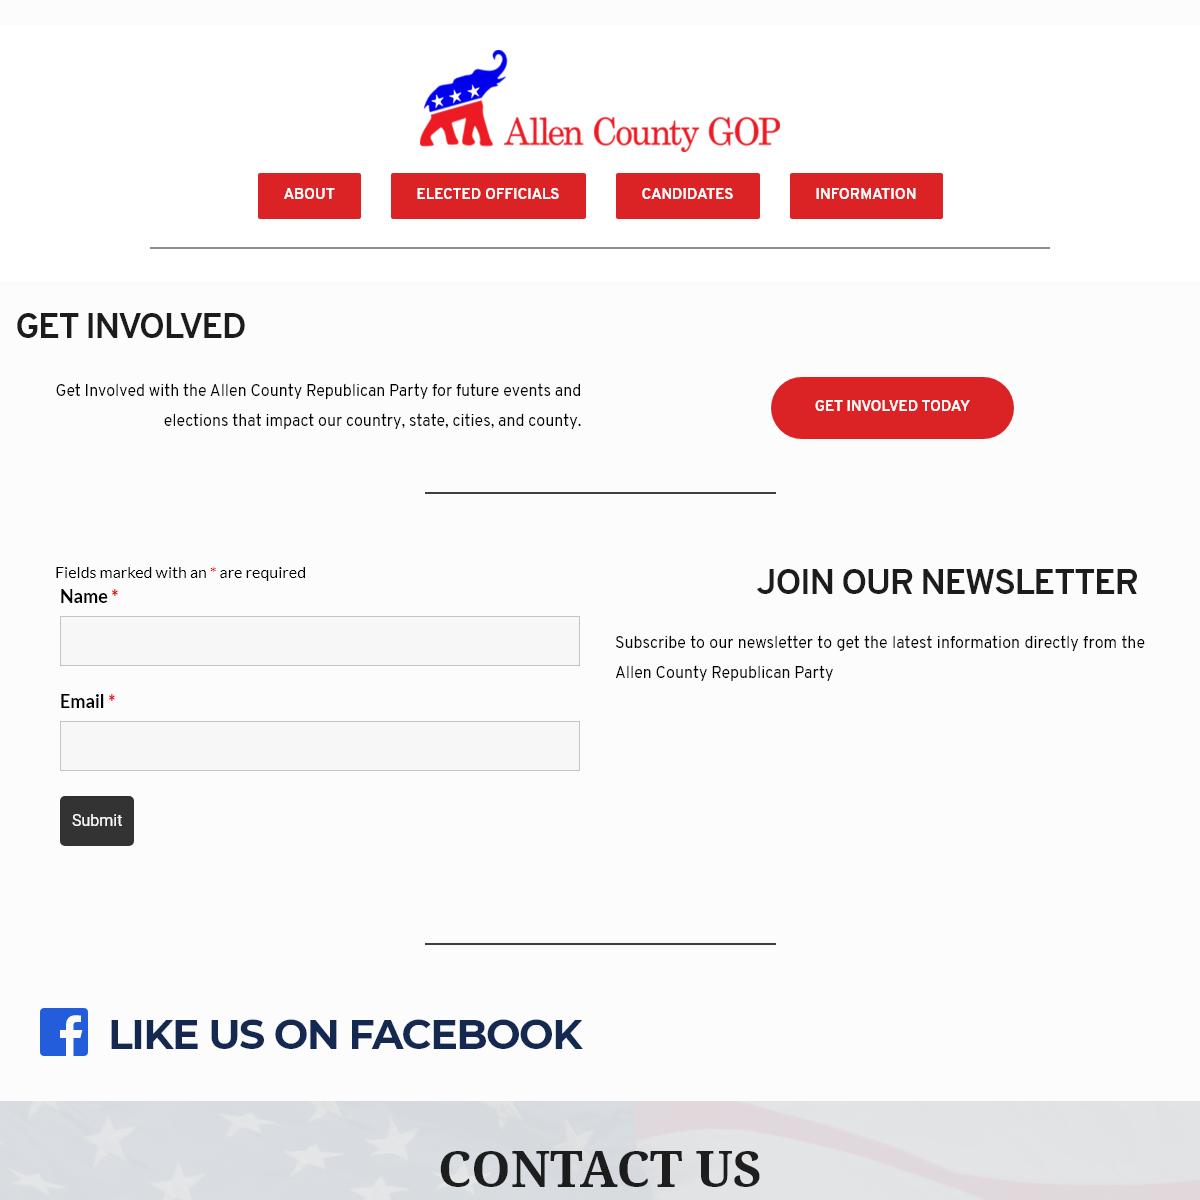 Allen County GOP – Indiana Allen County Republican Party